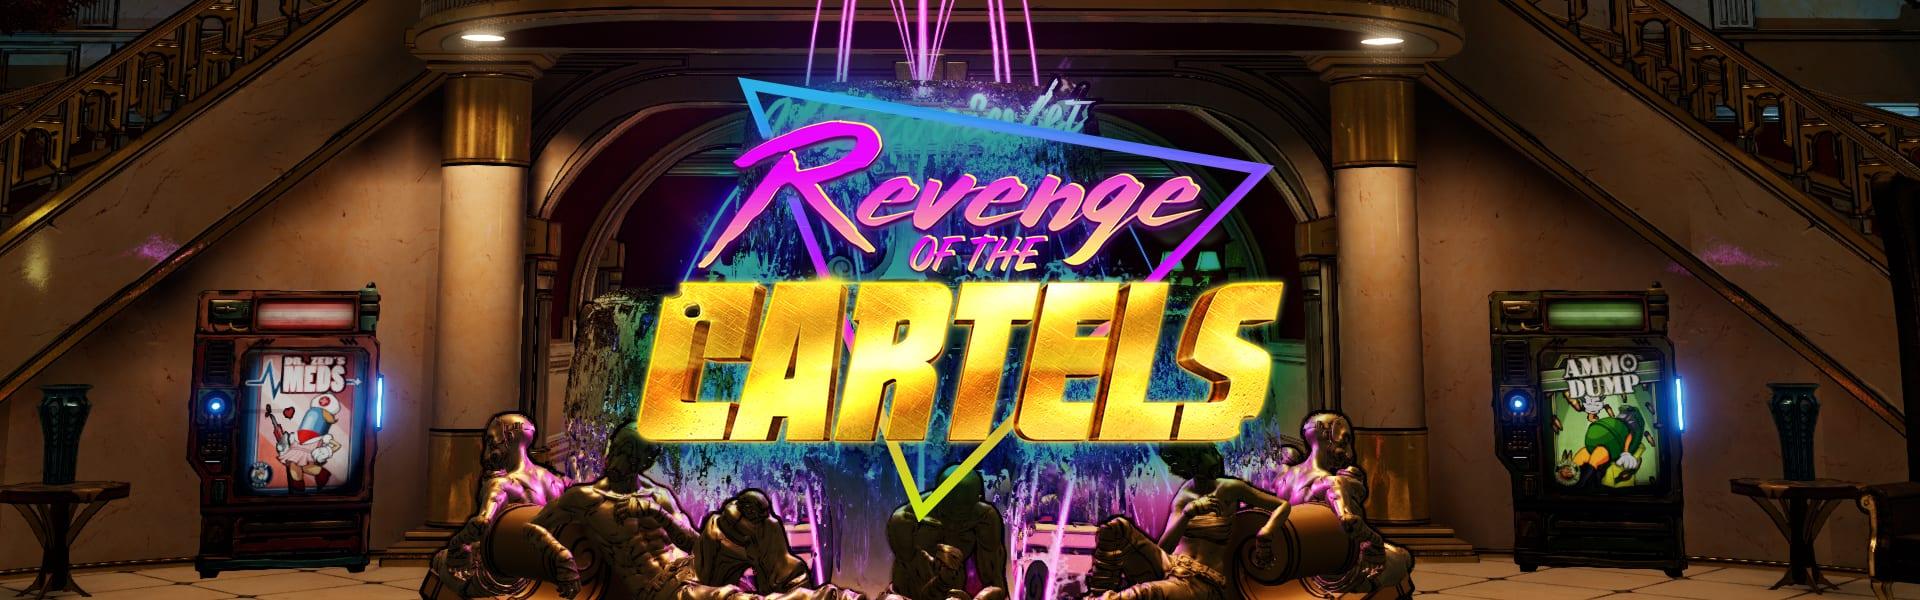 Firewall Legendary Shield Borderlands 3 Revenge of the Cartels